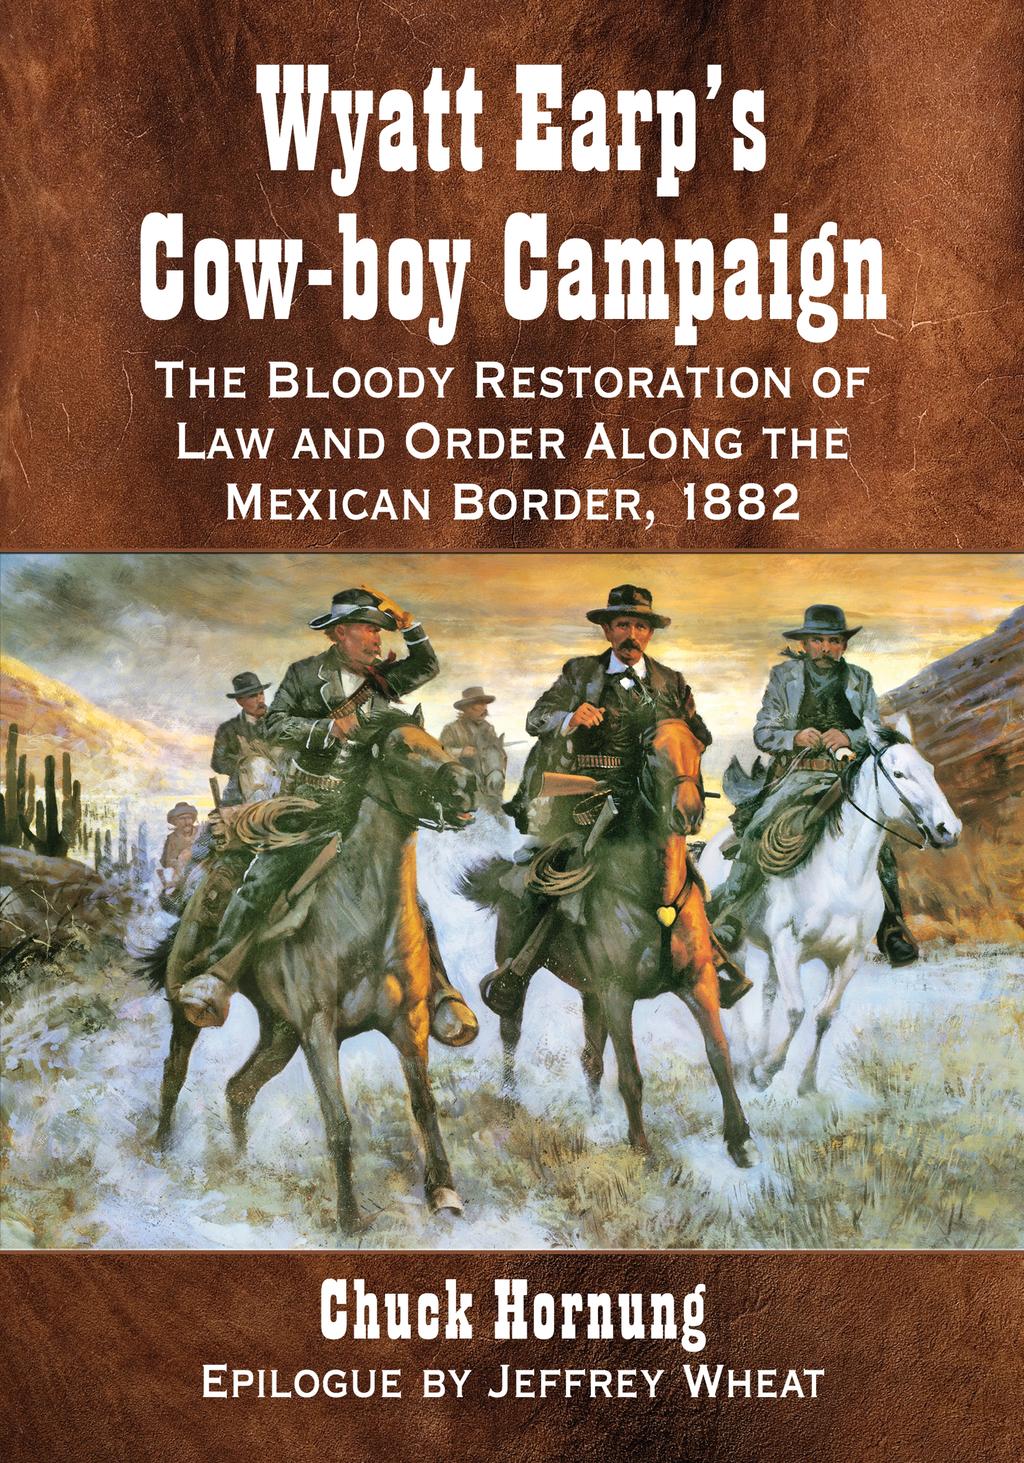 By Chuck Hornung PRINTISBN: 9781476663449 E-TEXT ISBN: 9781476624655 Edition: 0